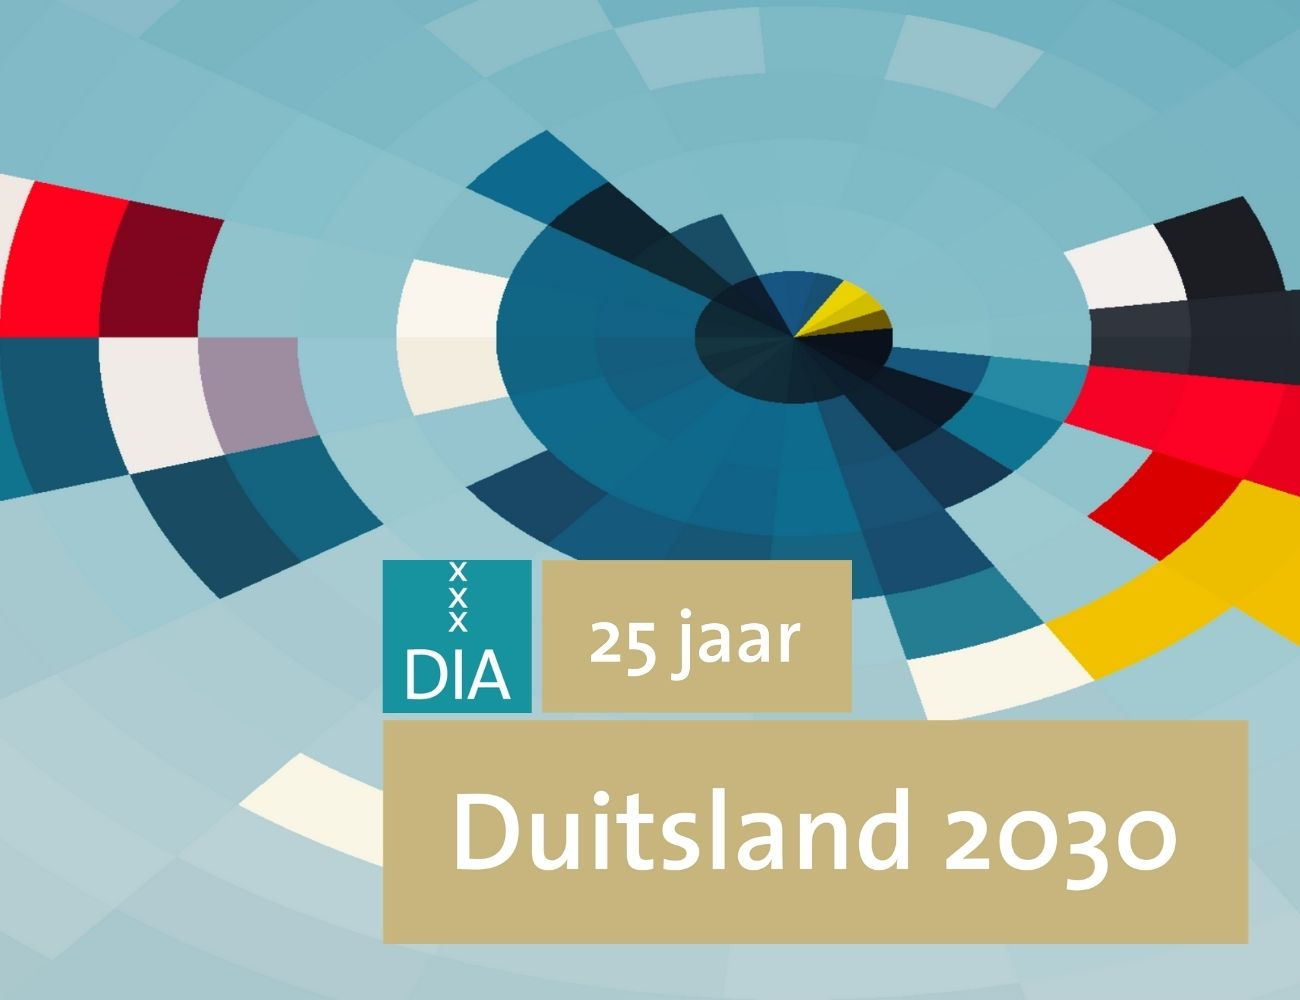 Duitsland Instituut organiseert online festival 'Duitsland 2030'